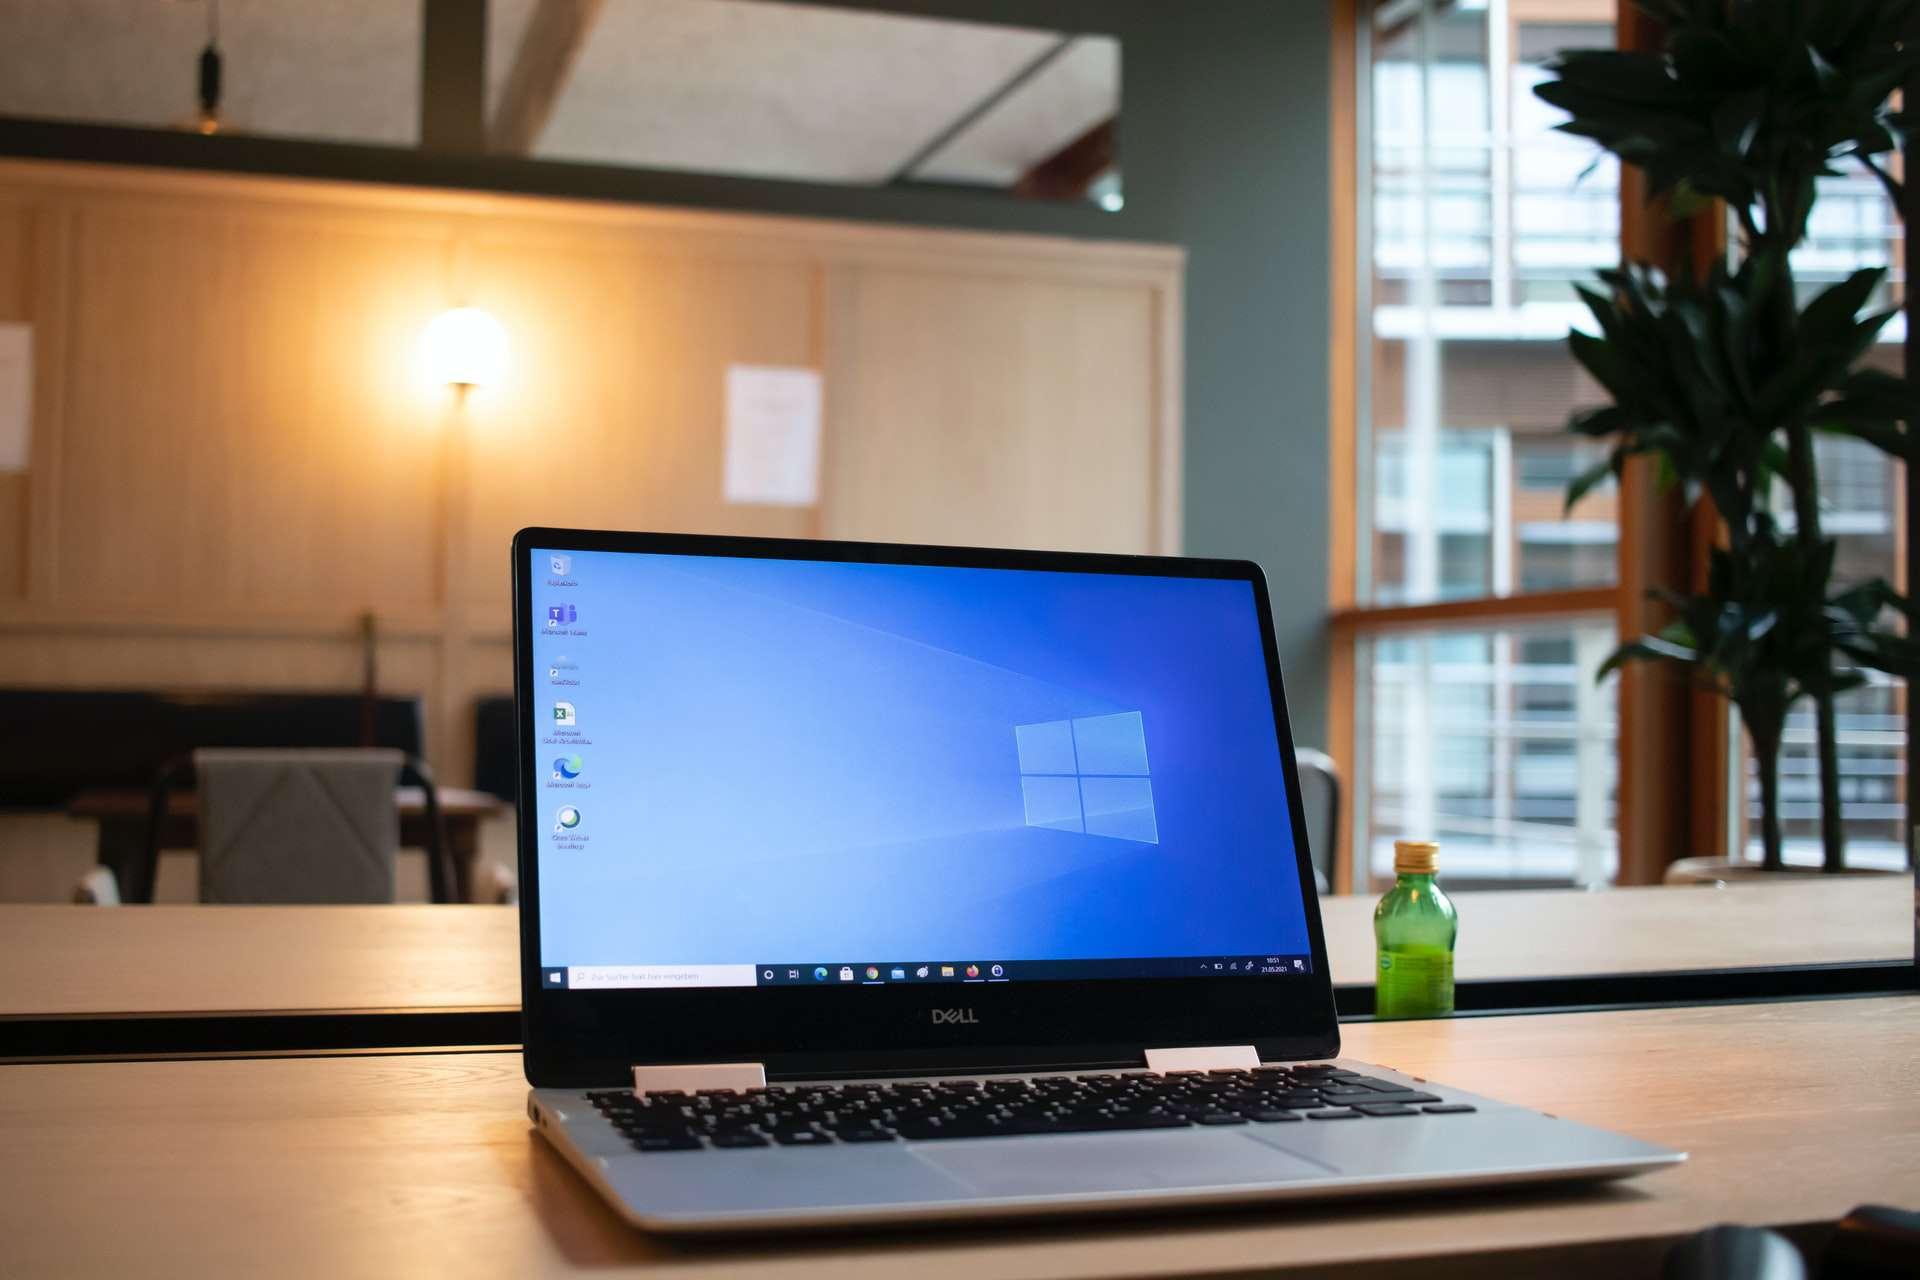 A Dell laptop running Windows 10